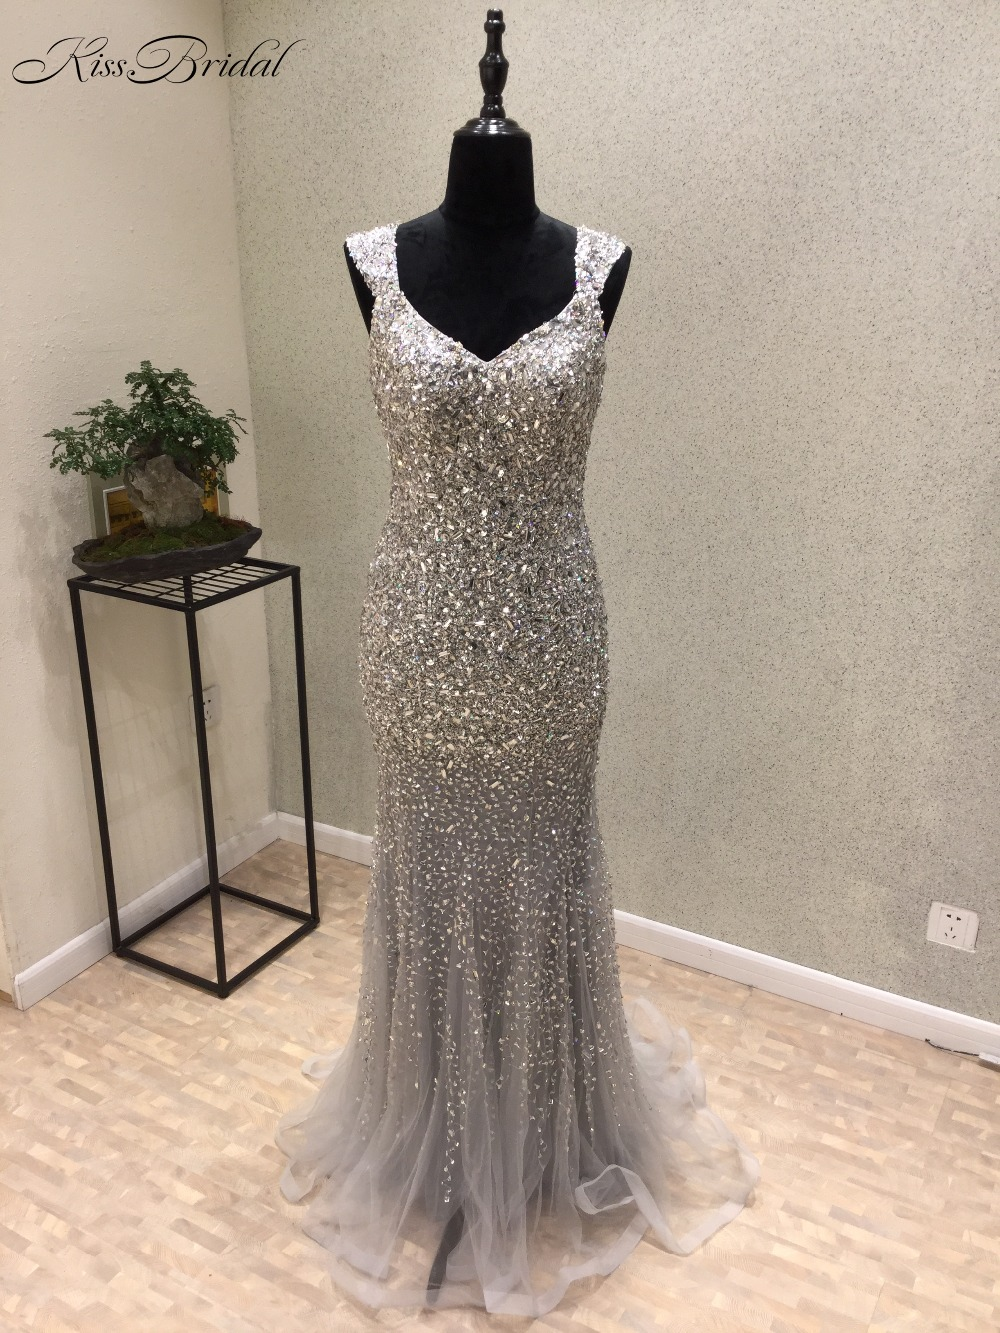 abiye gece elbisesi Luxury   Prom     Dresses   2018 Sweetheart Cap Sleeve Floor Length Beading Tulle Mermaid Party   Dress   Evening Gowns